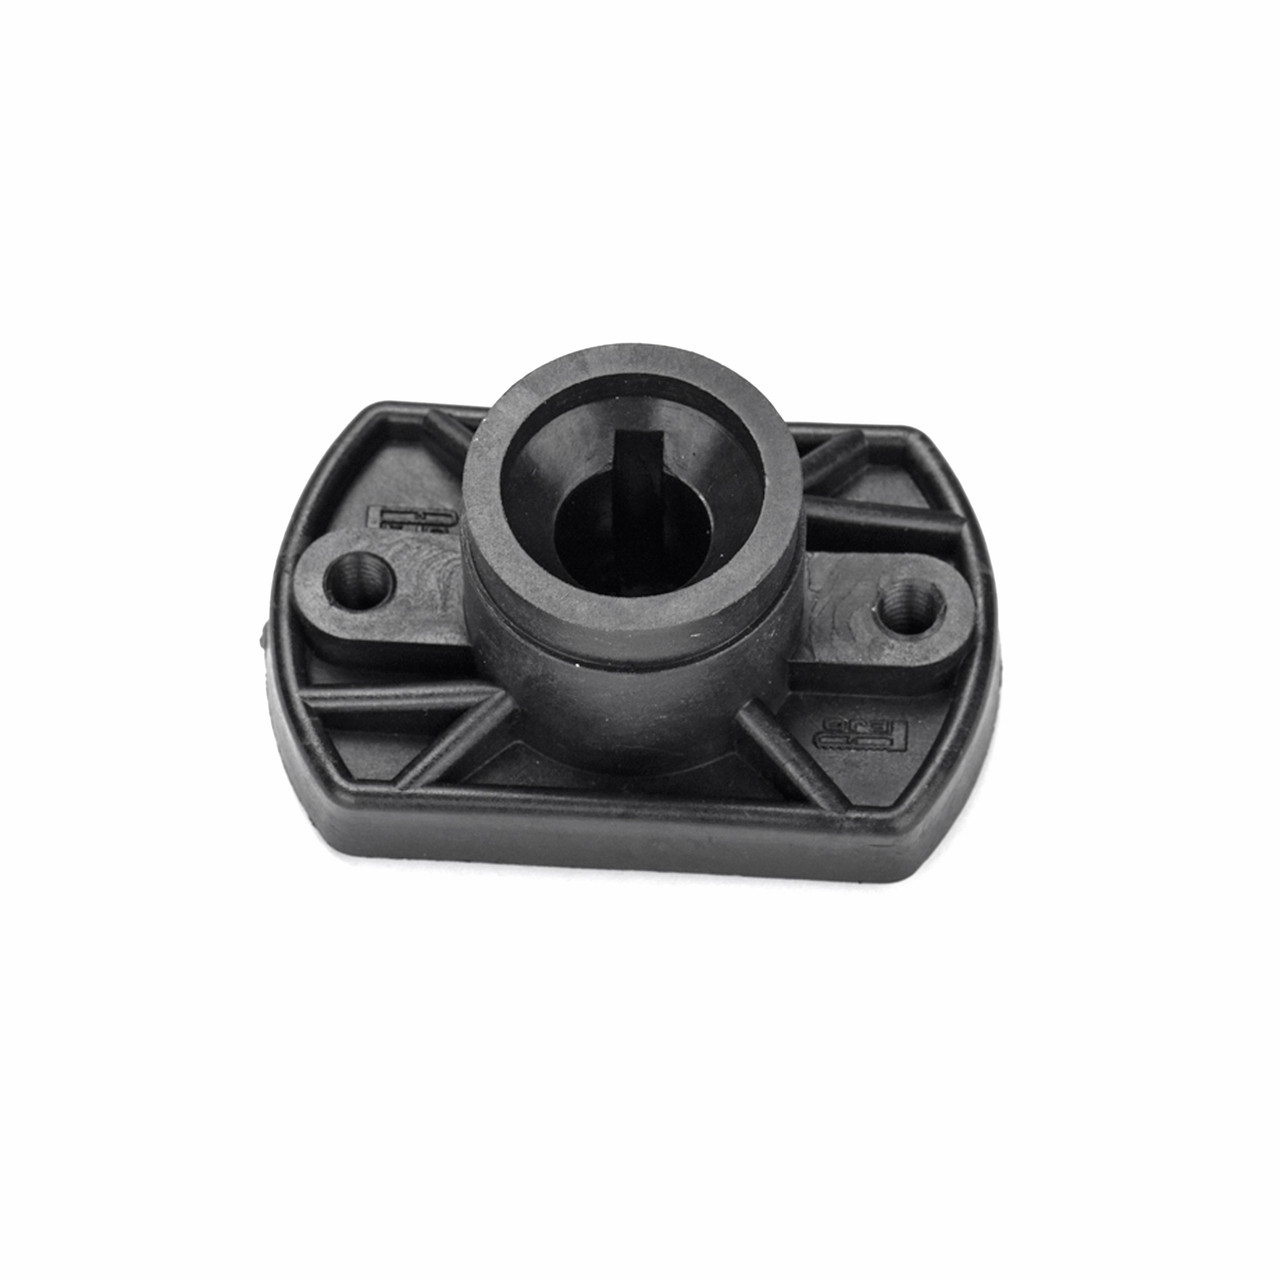 Alpina Castor Castelgarden BL41E blade adaptor,22463186-1